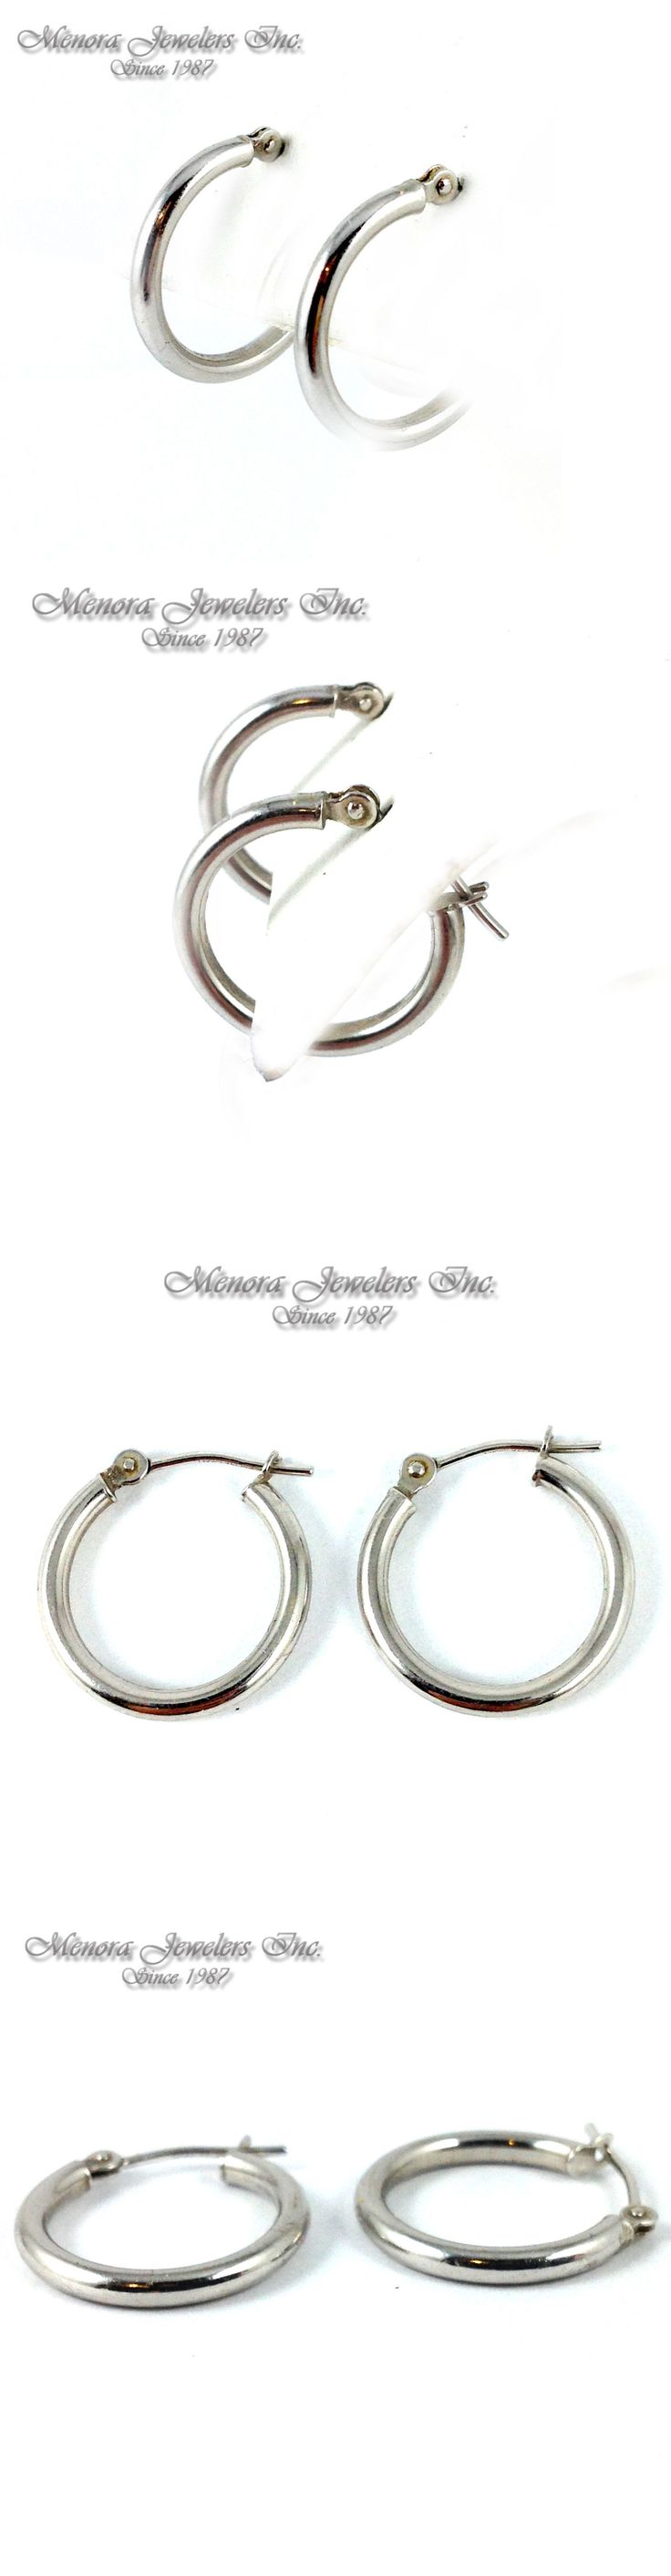 17 Best ideas about Small Gold Hoop Earrings on Pinterest